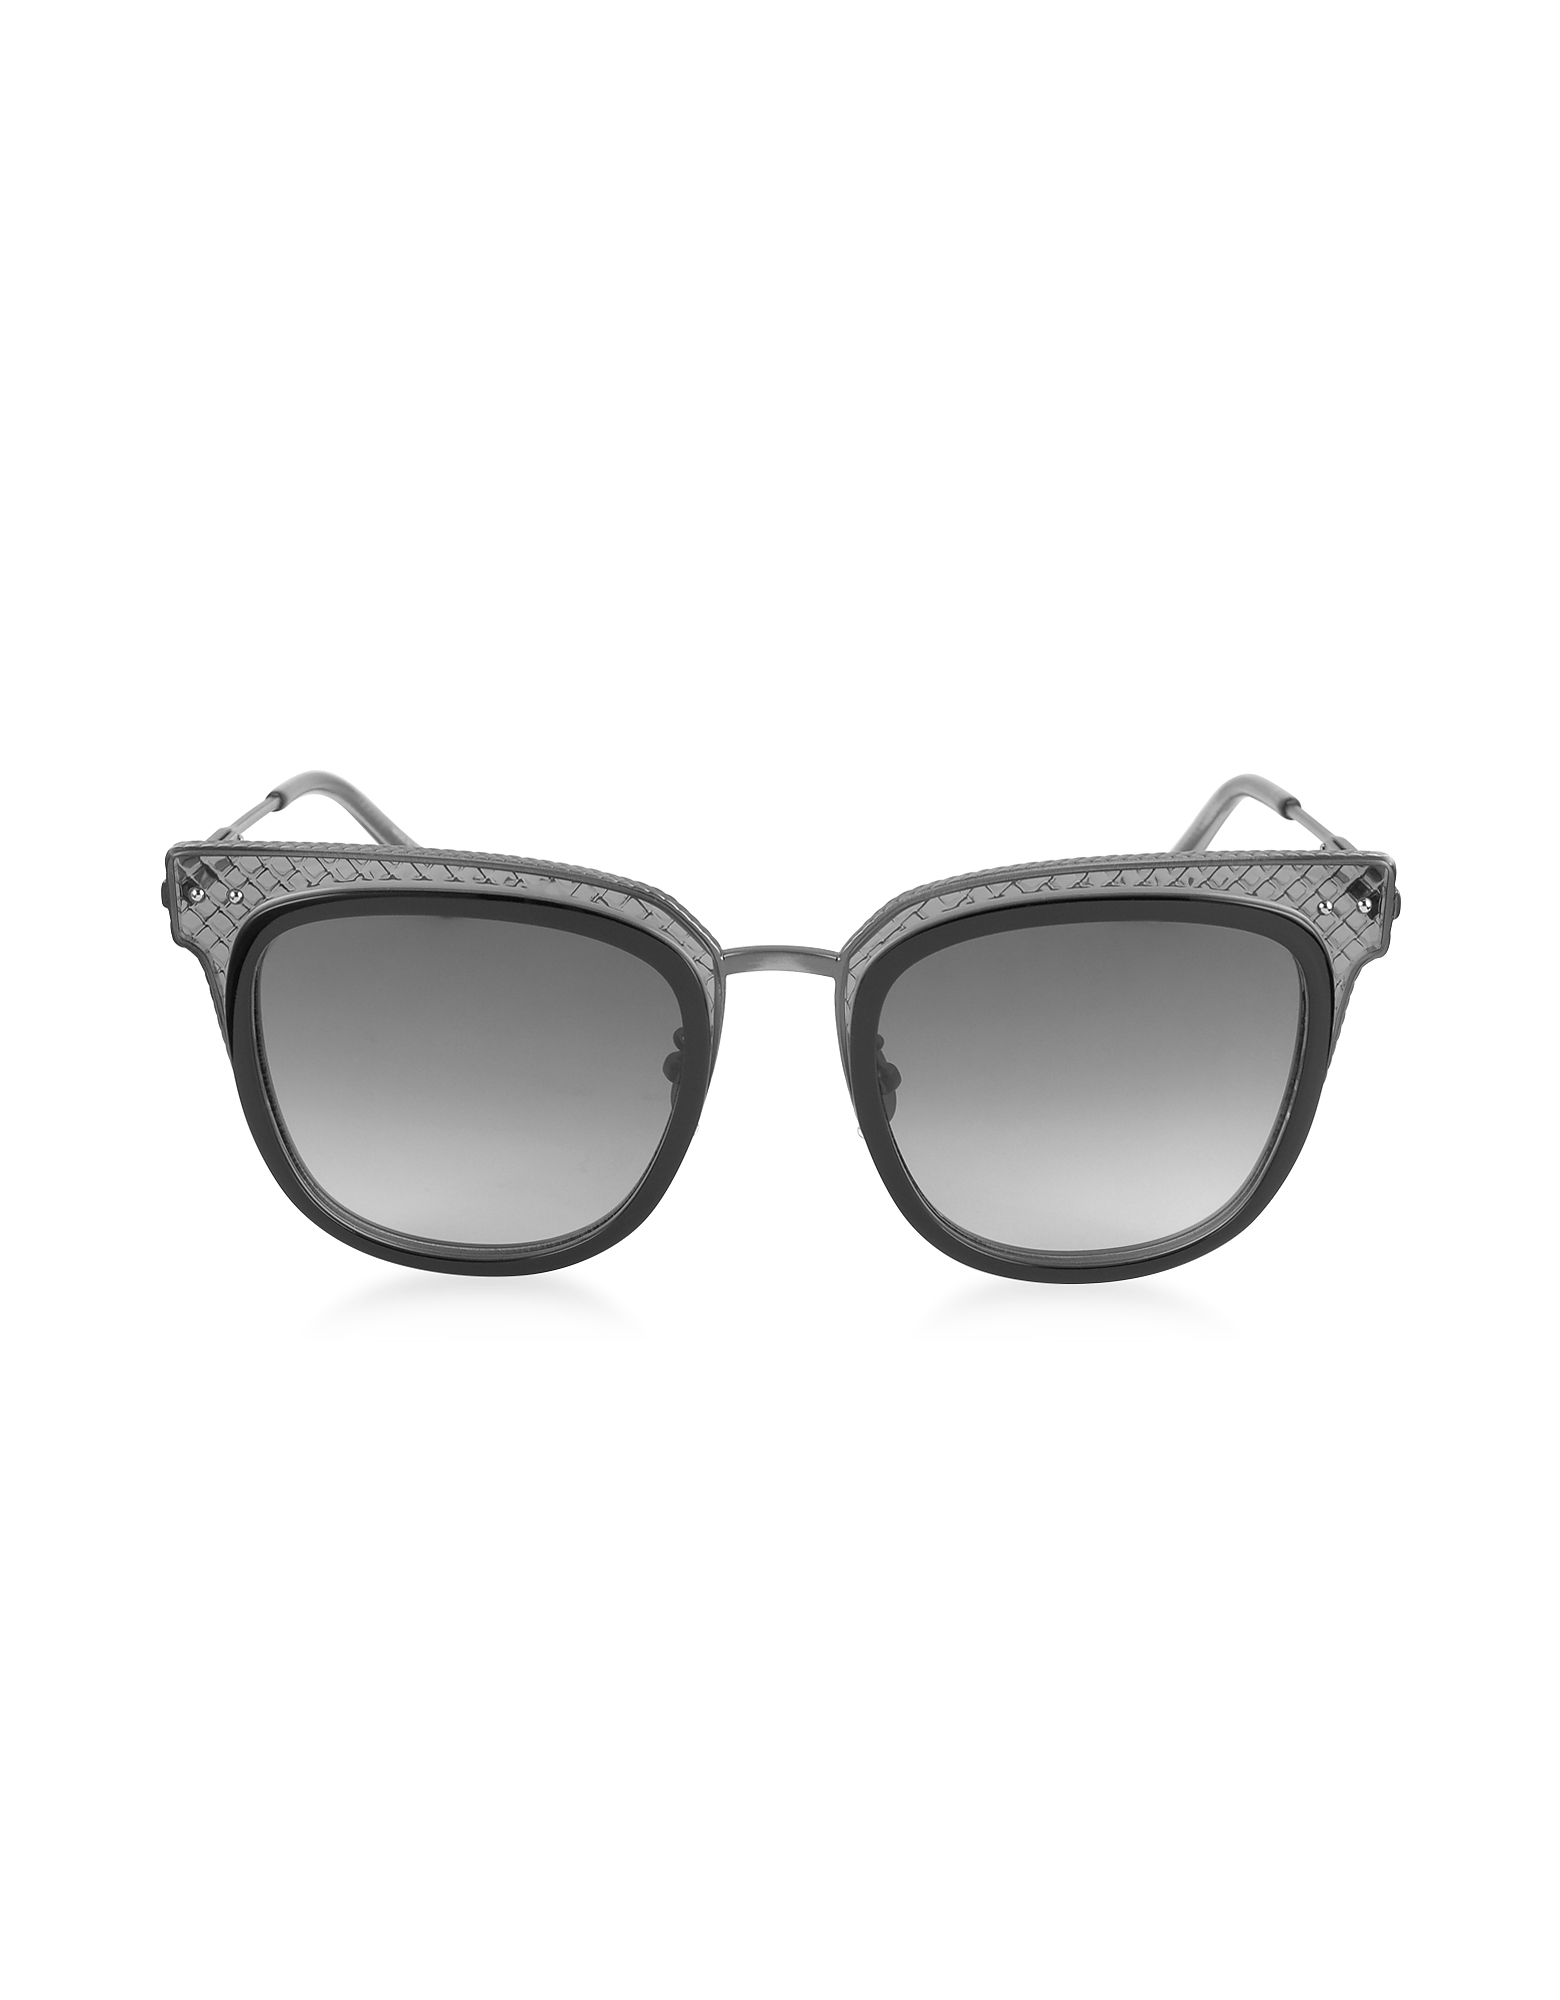 Bottega Veneta Designer Sunglasses, BV0122S Square Acetate Frame Women's Sunglasses